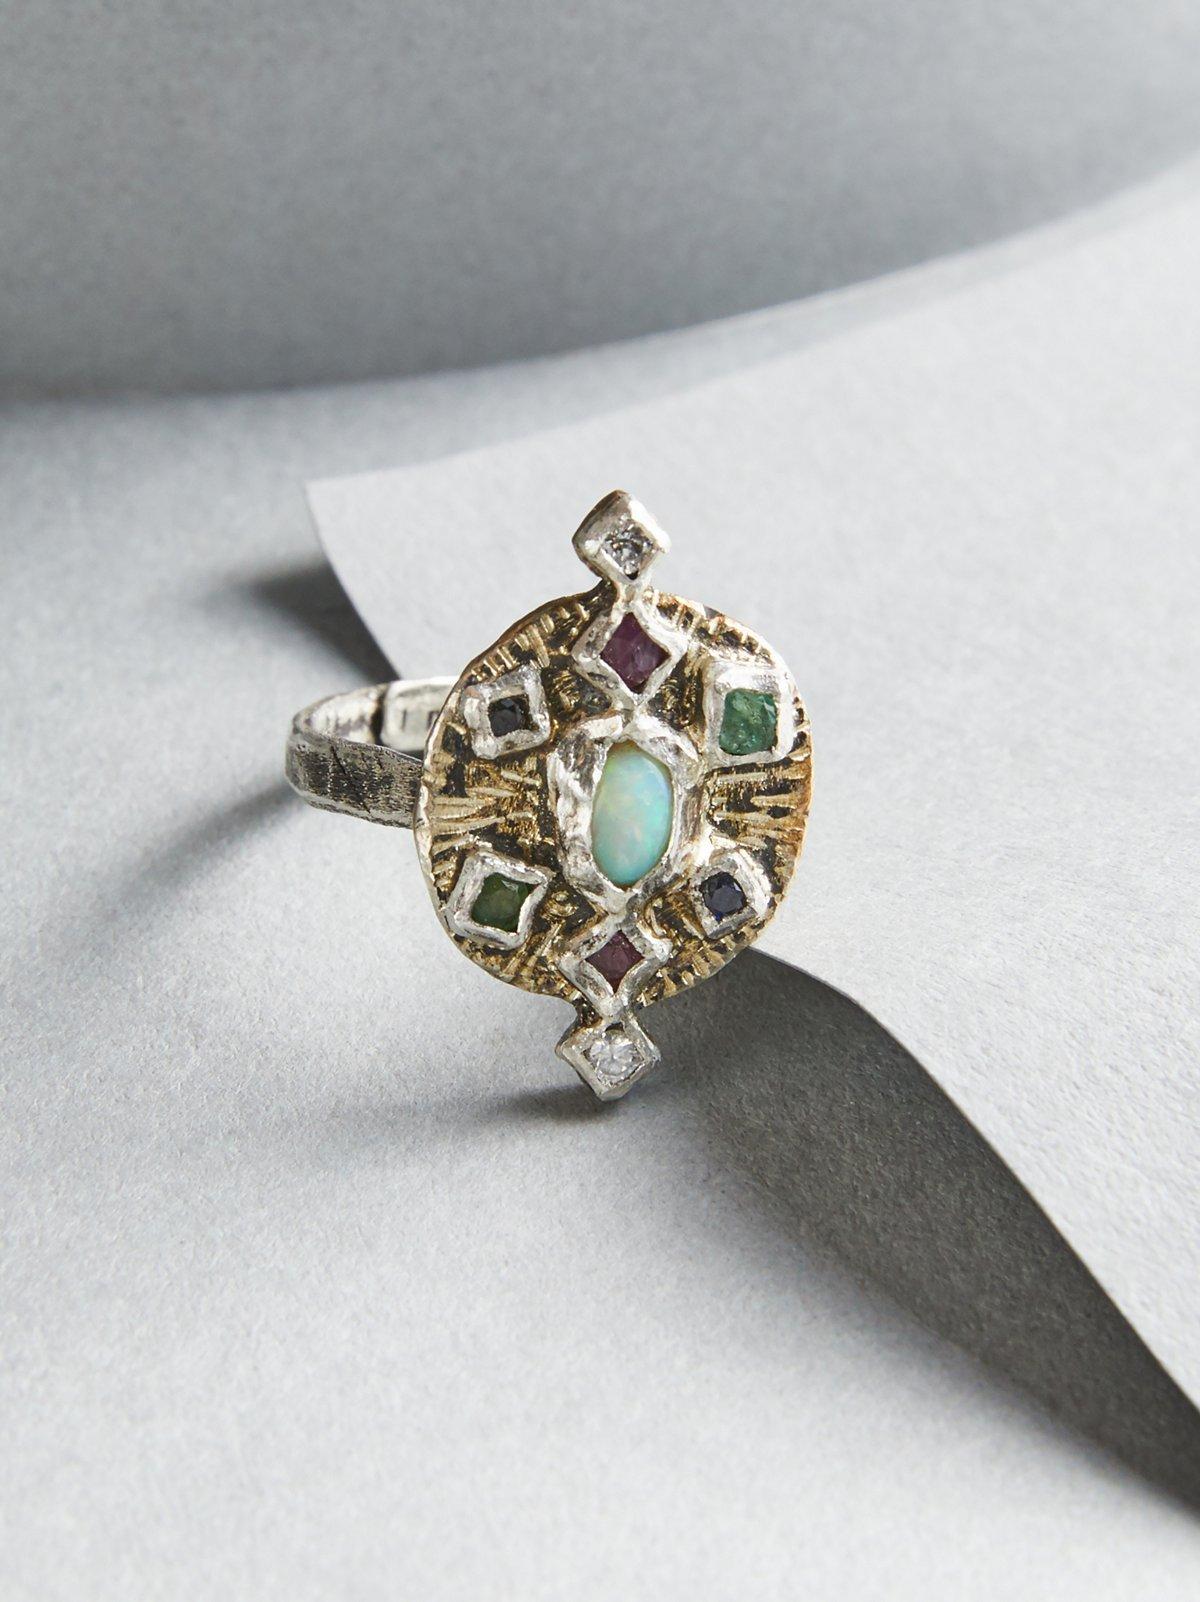 Rain Free Diamond x Sapphire Mix Ring